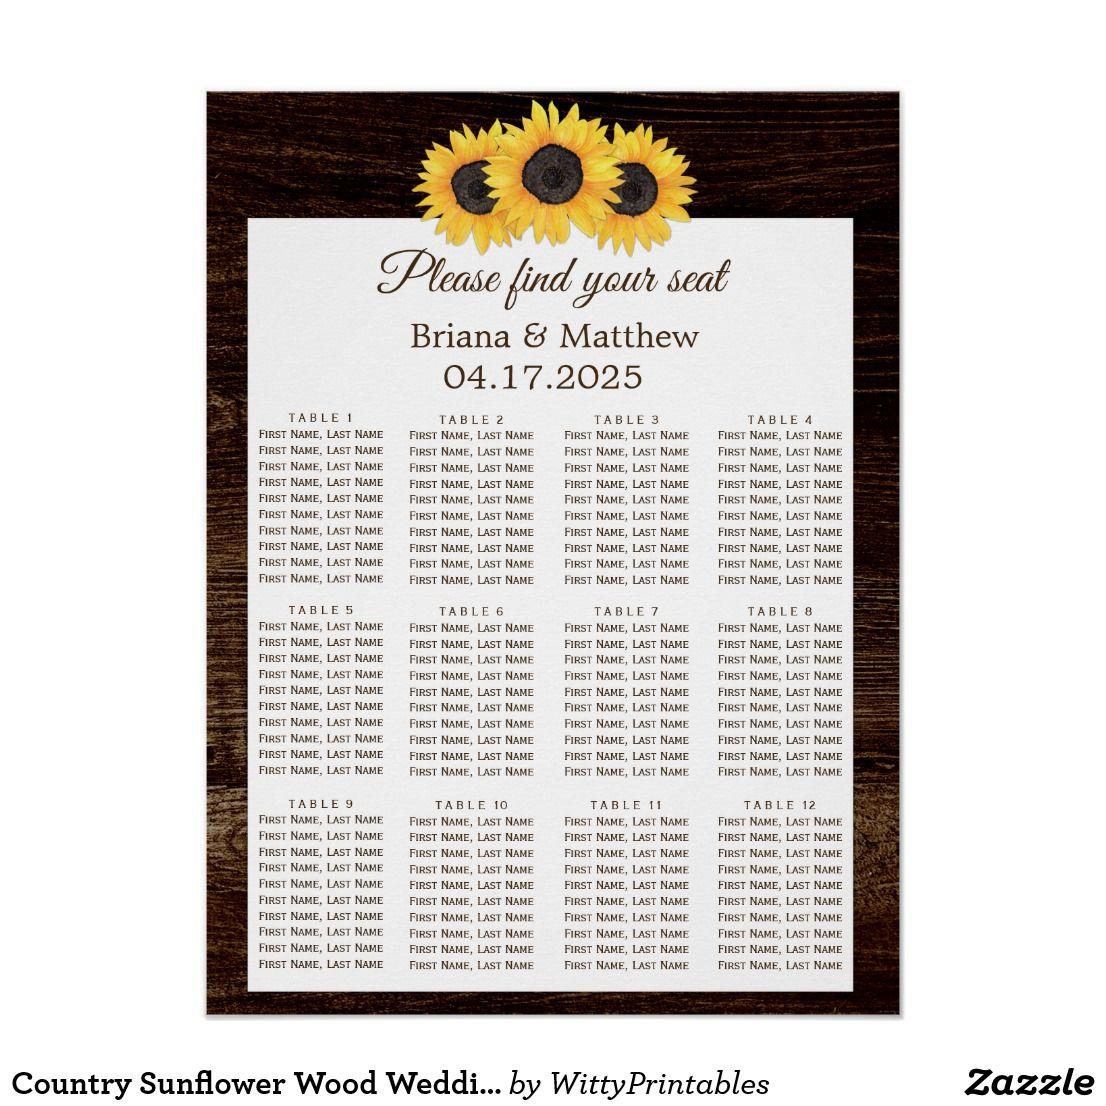 Country Sunflower Wood Wedding Seating Chart | Sunflower wedding ...